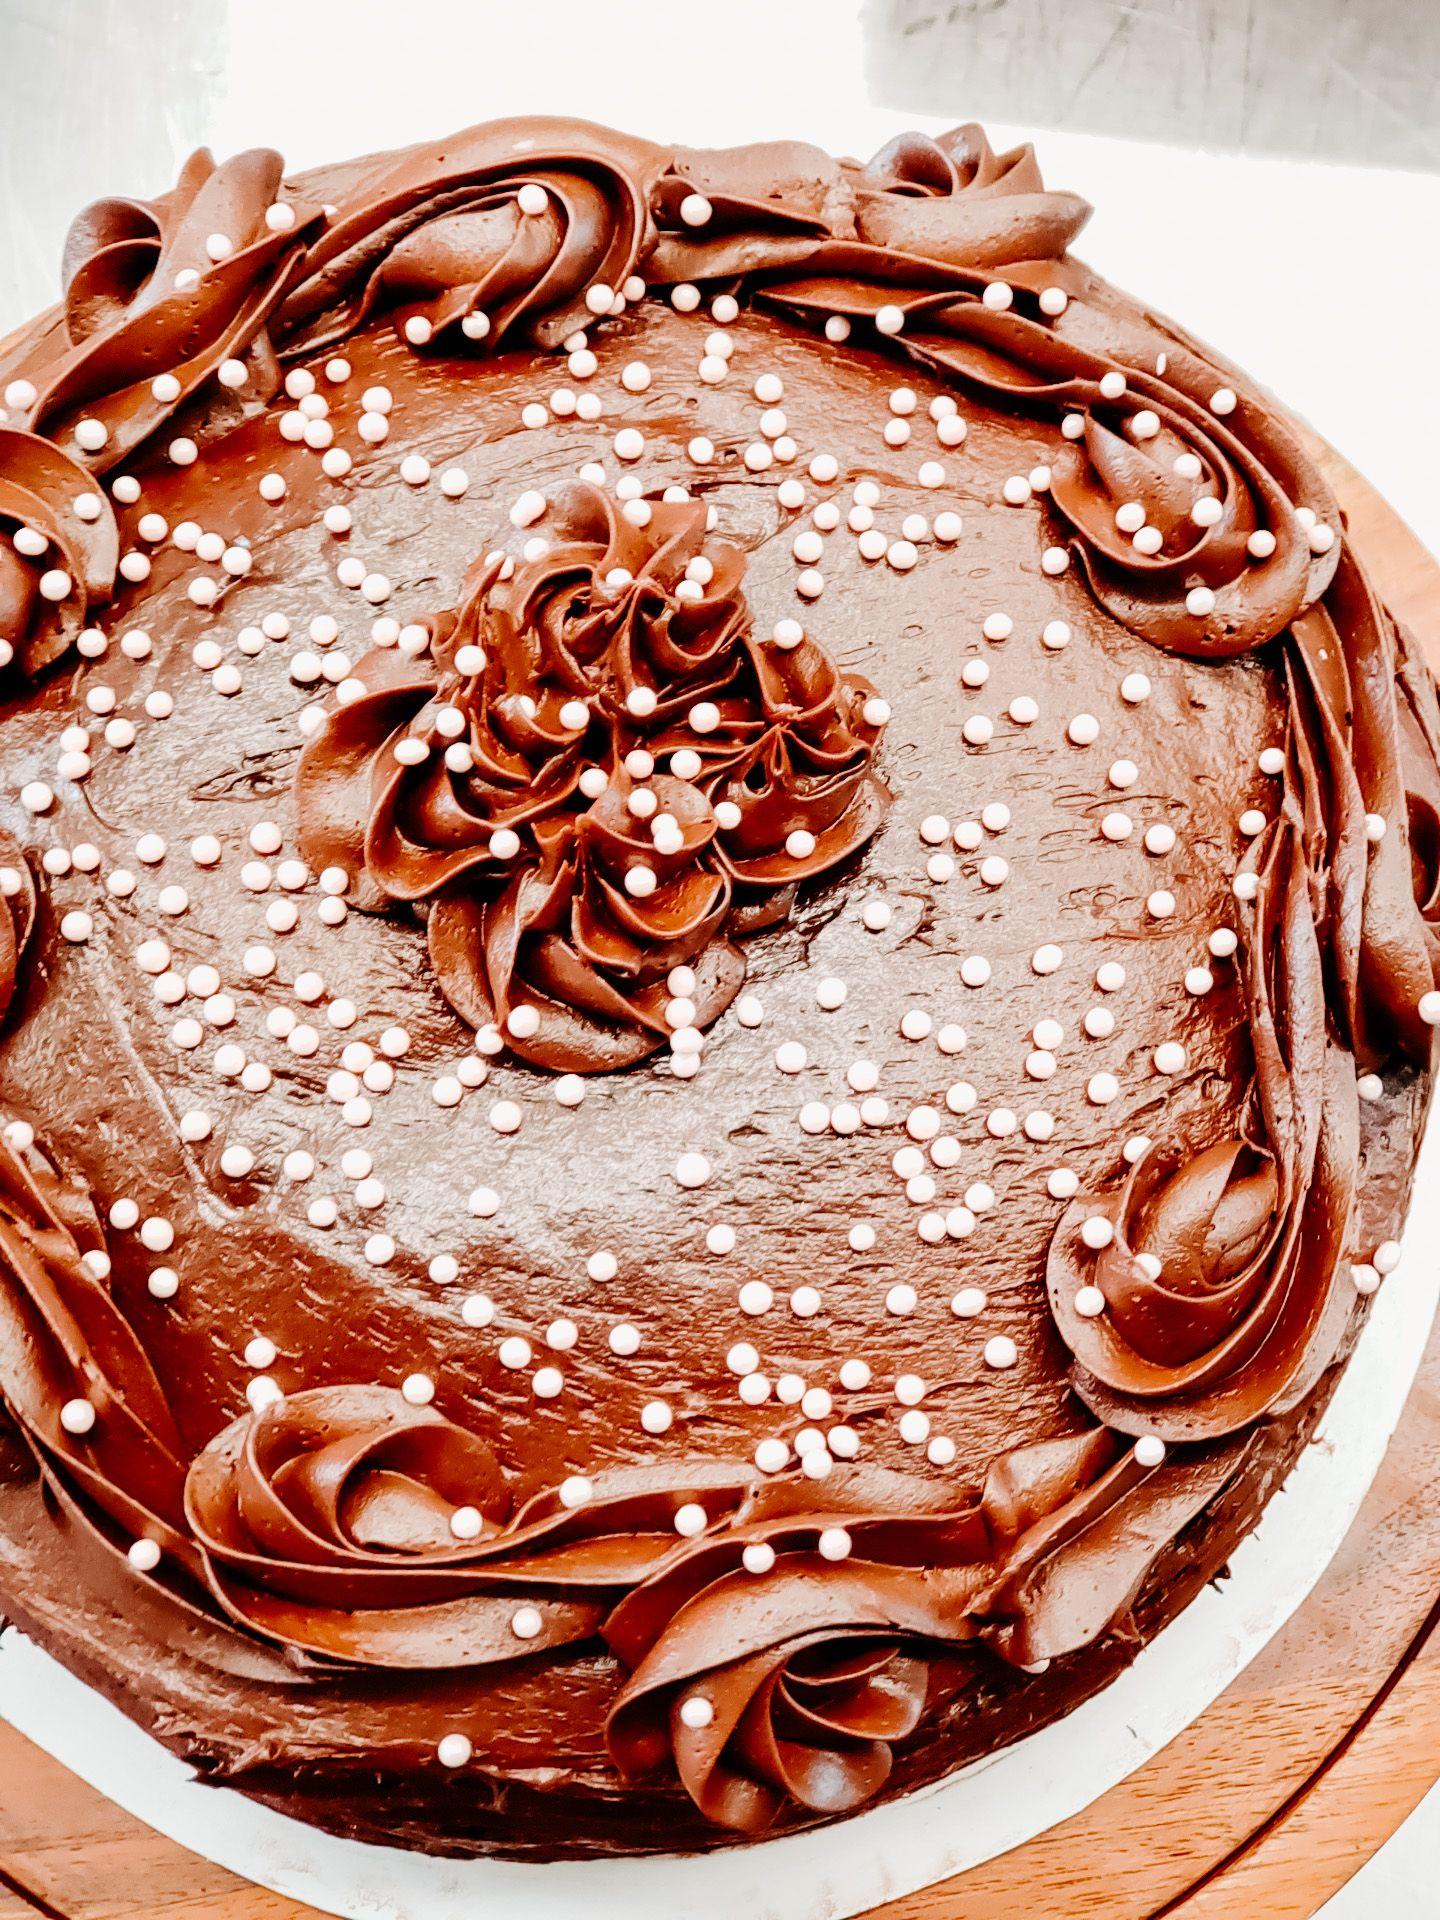 Vanilla Cupcakes at Ashford Acres Inn in 2020 Breakfast